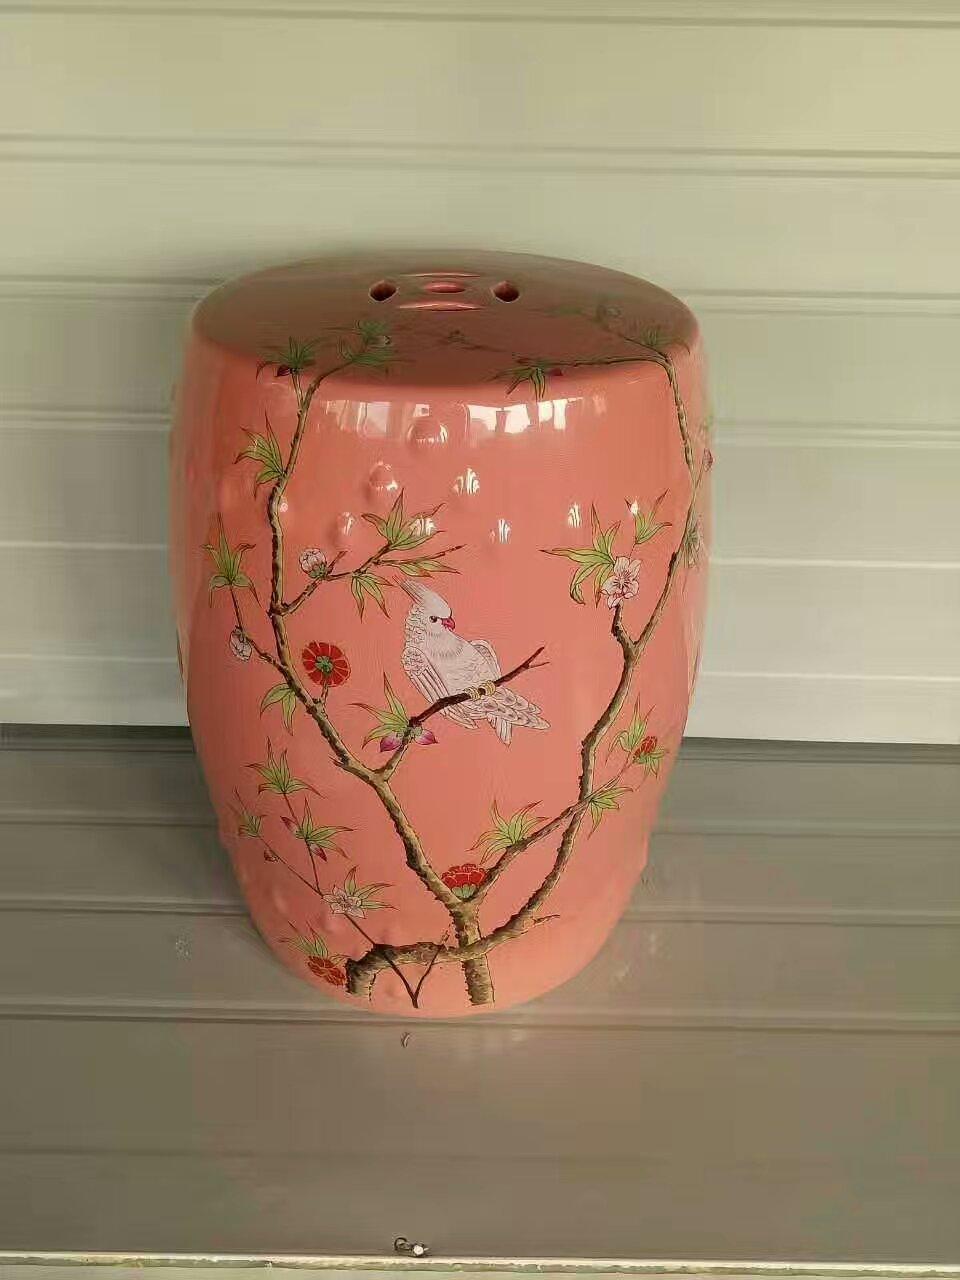 Parrot Painting Jindezhen Dressing Ceramic Garden Stool Chinese Ceramic  Drum Stool Bathroom Porcelain Pink Ceramic Drum Stool